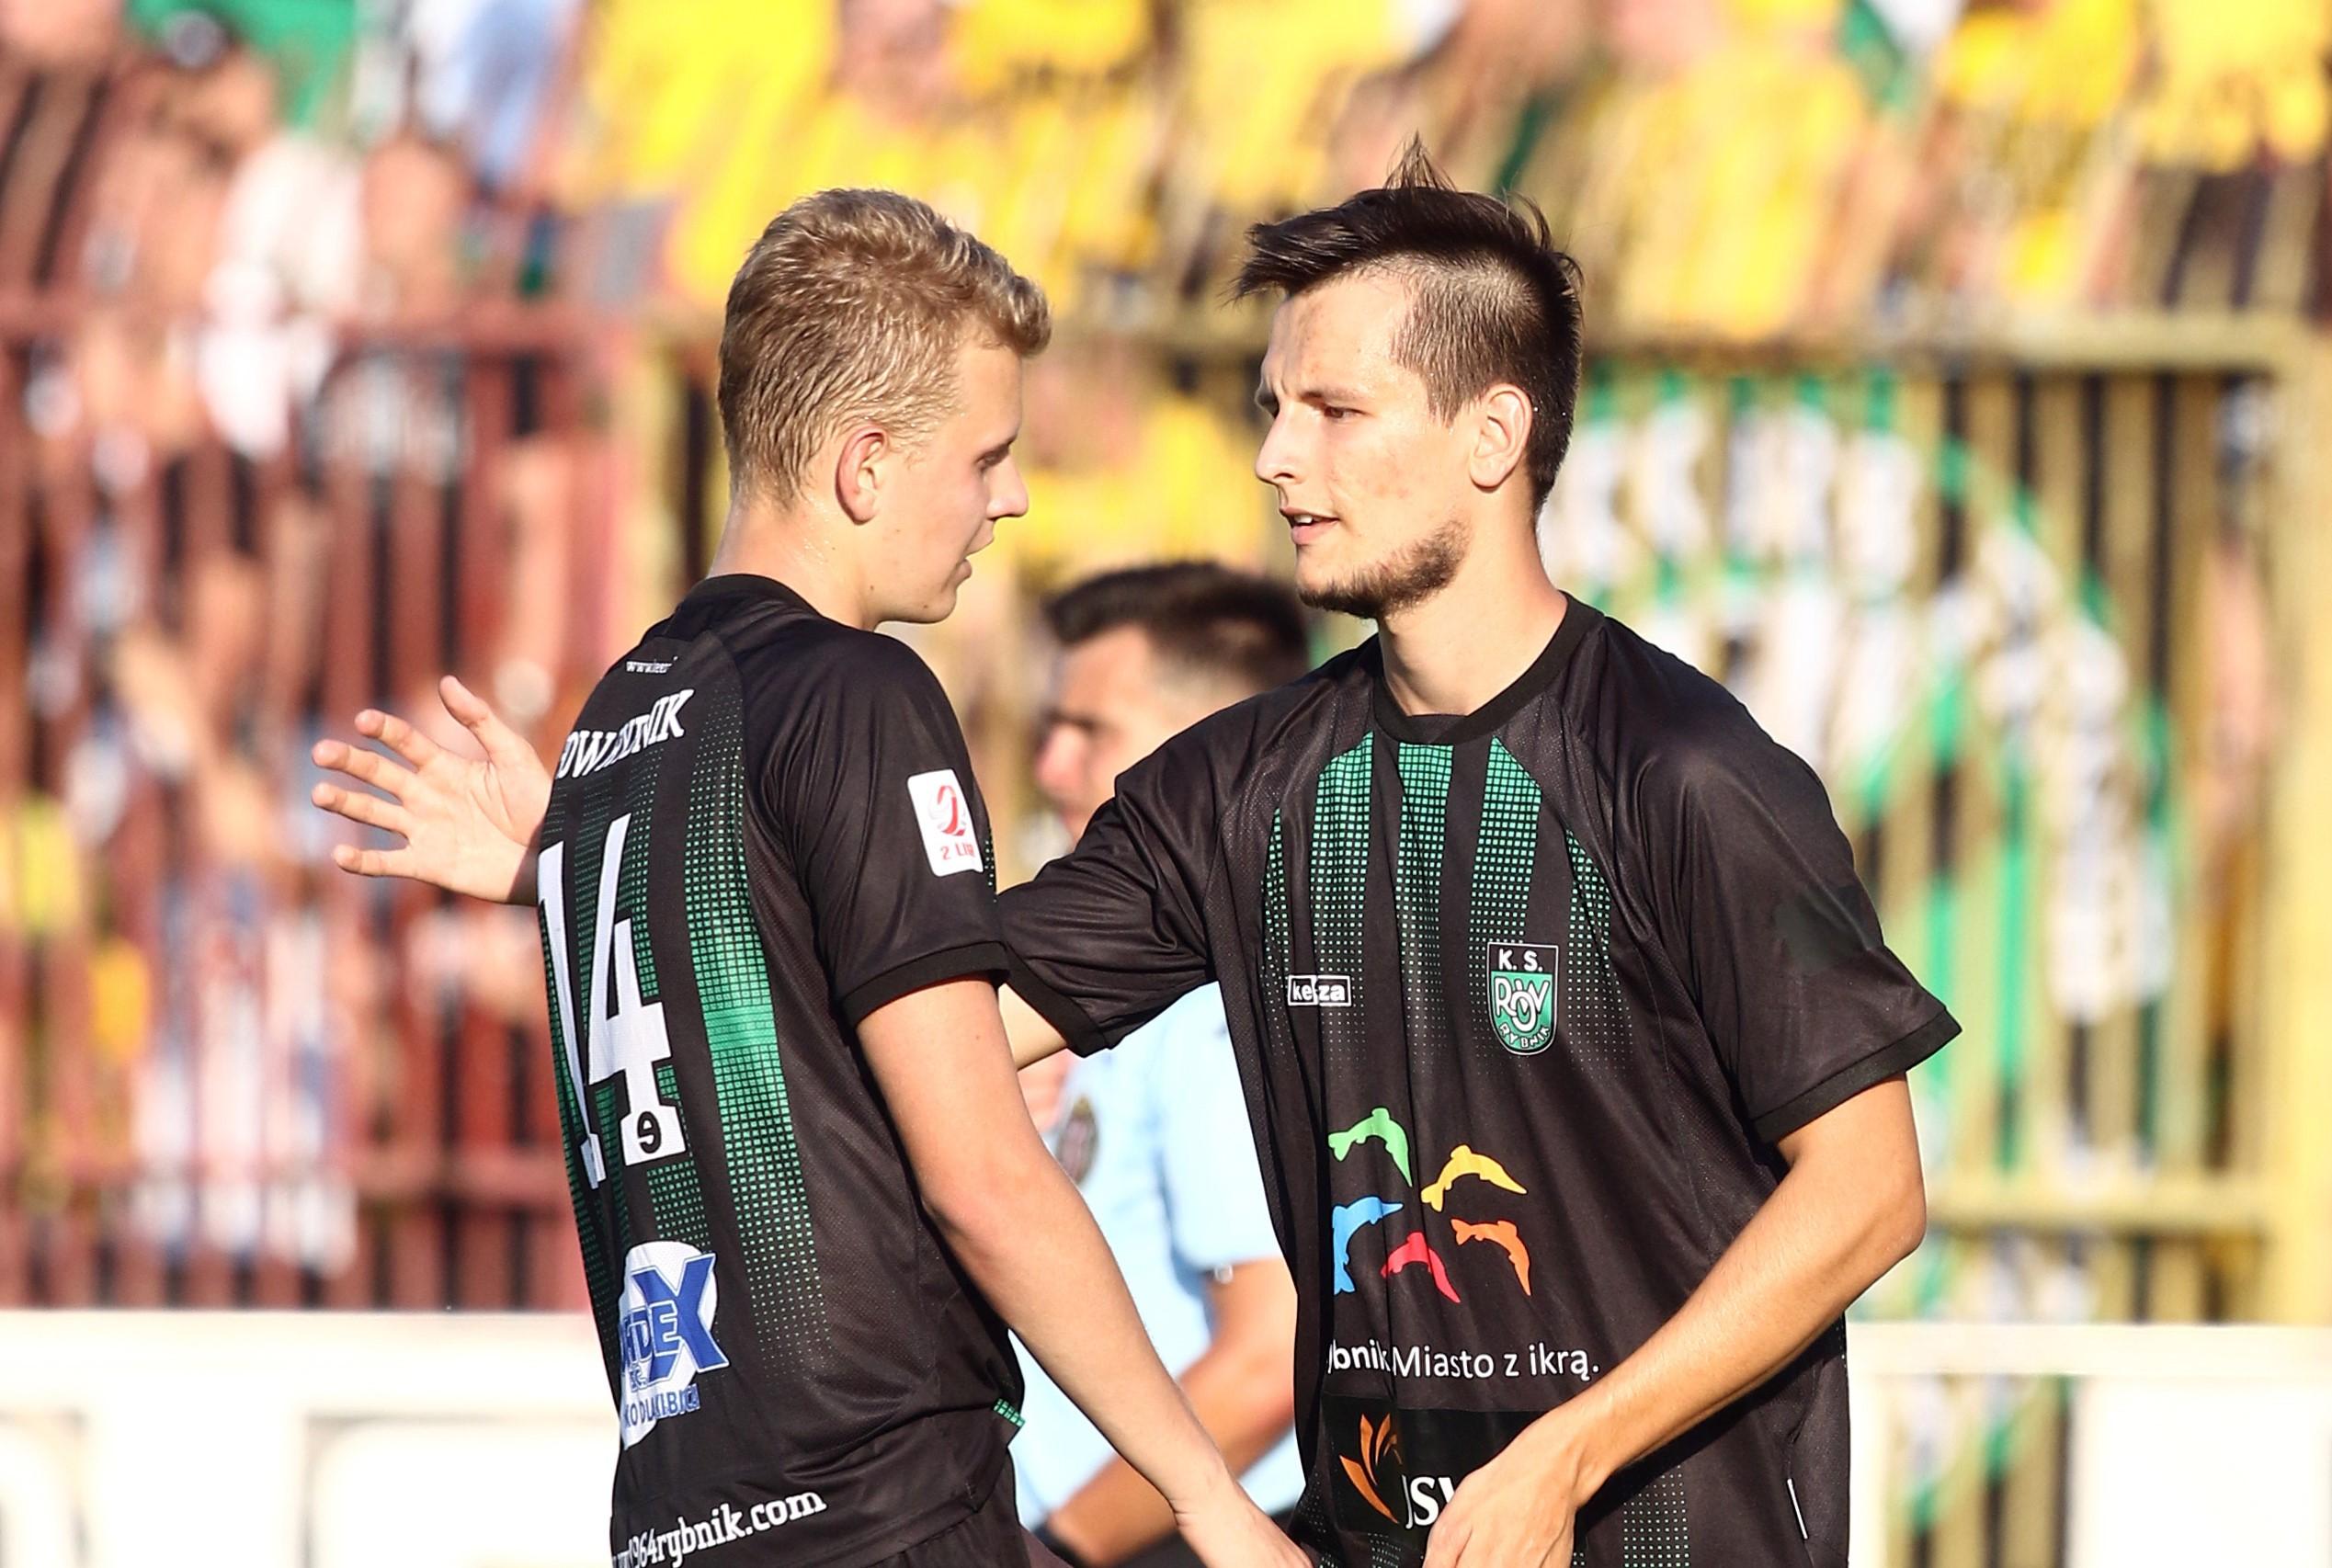 Wiktor Piejak